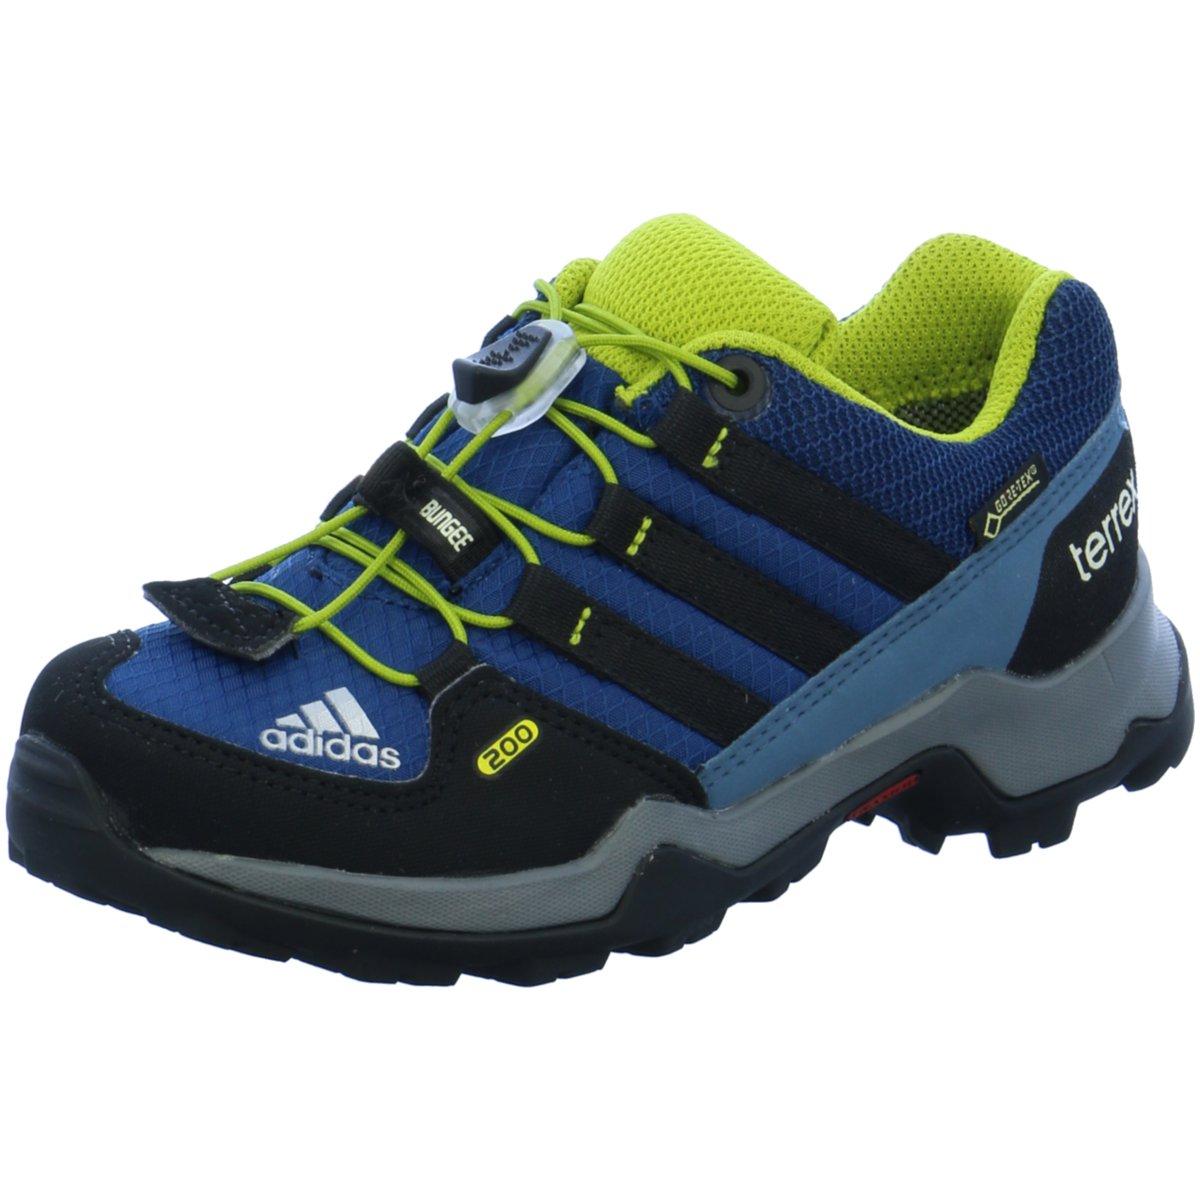 adidas Kinder Bergschuhe AQ4139 Terrex GTX blau 182315